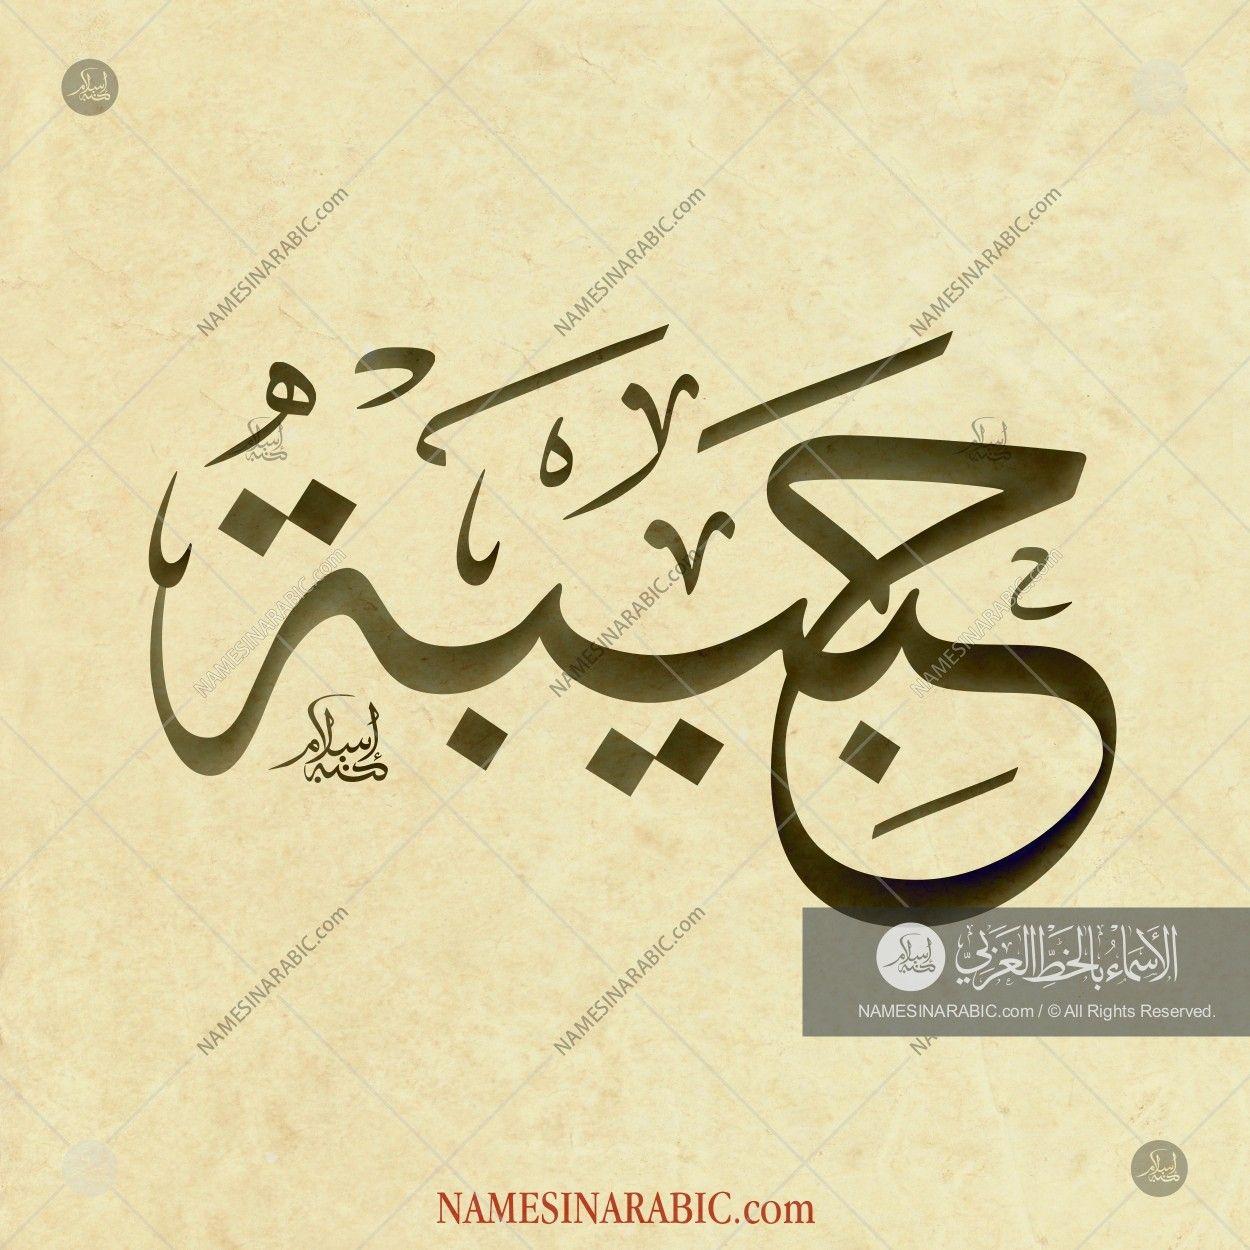 Habiba حبيبة Names In Arabic Calligraphy Name 3322 Calligraphy Name Calligraphy Islamic Art Calligraphy